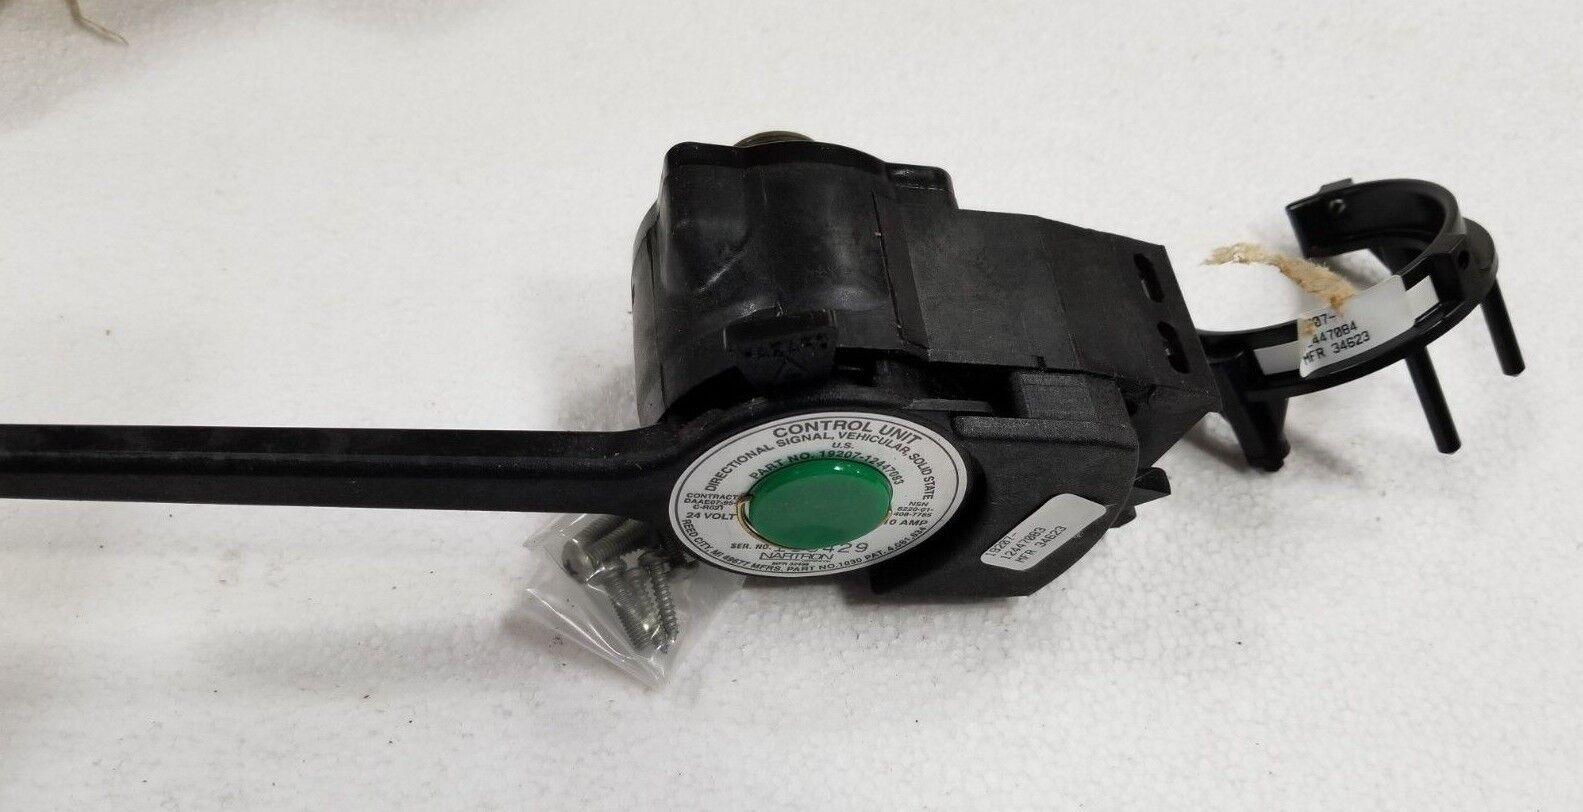 NO LOGO XW-Turn Signal Turn 2 St/ück Dynamische R/ückspiegel Blinker Signal-LED-Licht for BMW F20 F30 F31 F21 F22 F23 F32 F33 F34 X1 E84 1 2 3 4 Serie